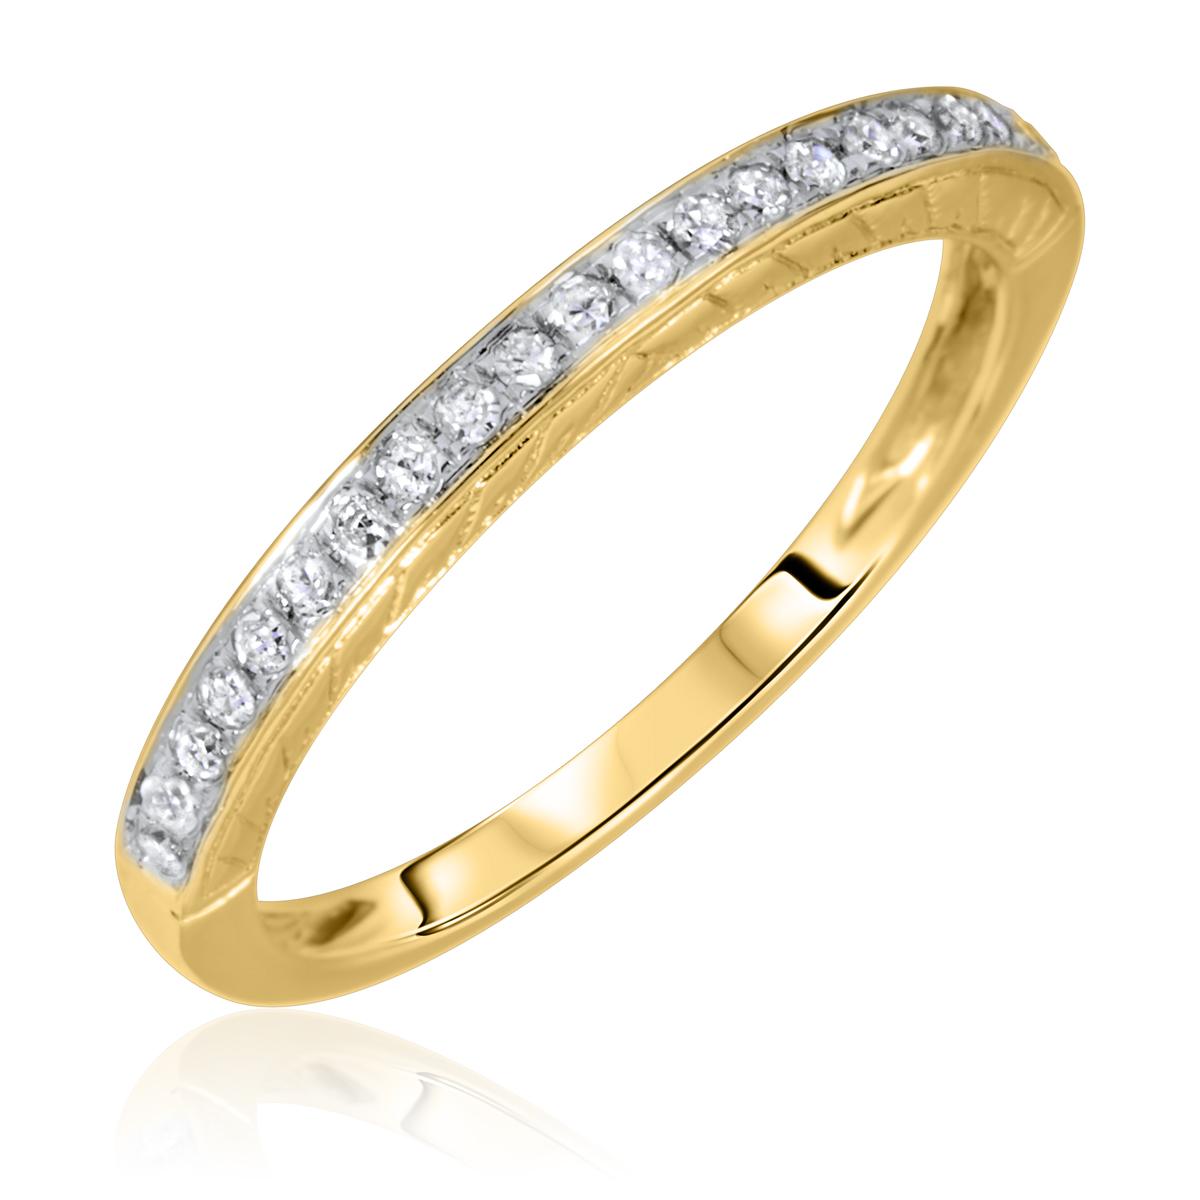 1 8 Carat T W Rounds Cut Diamond Ladies Wedding Band 14k Yellow